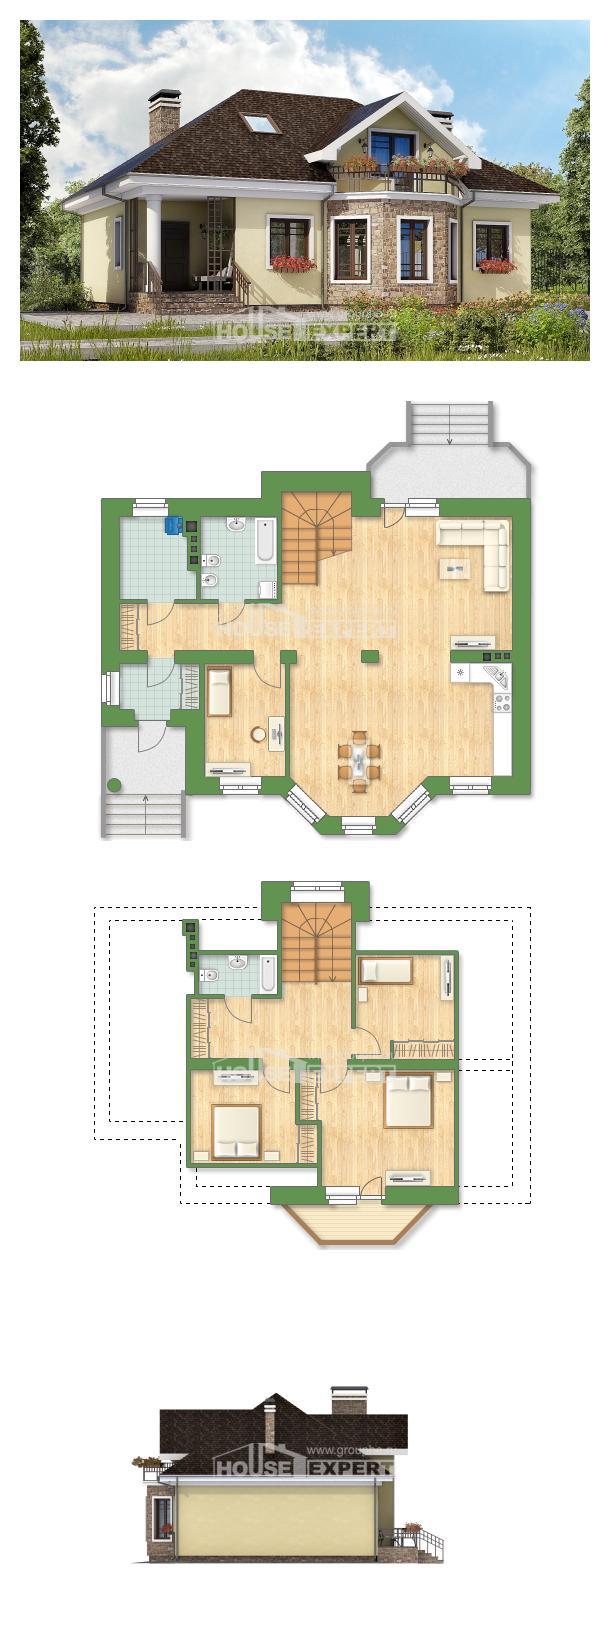 Проект дома 150-008-Л | House Expert